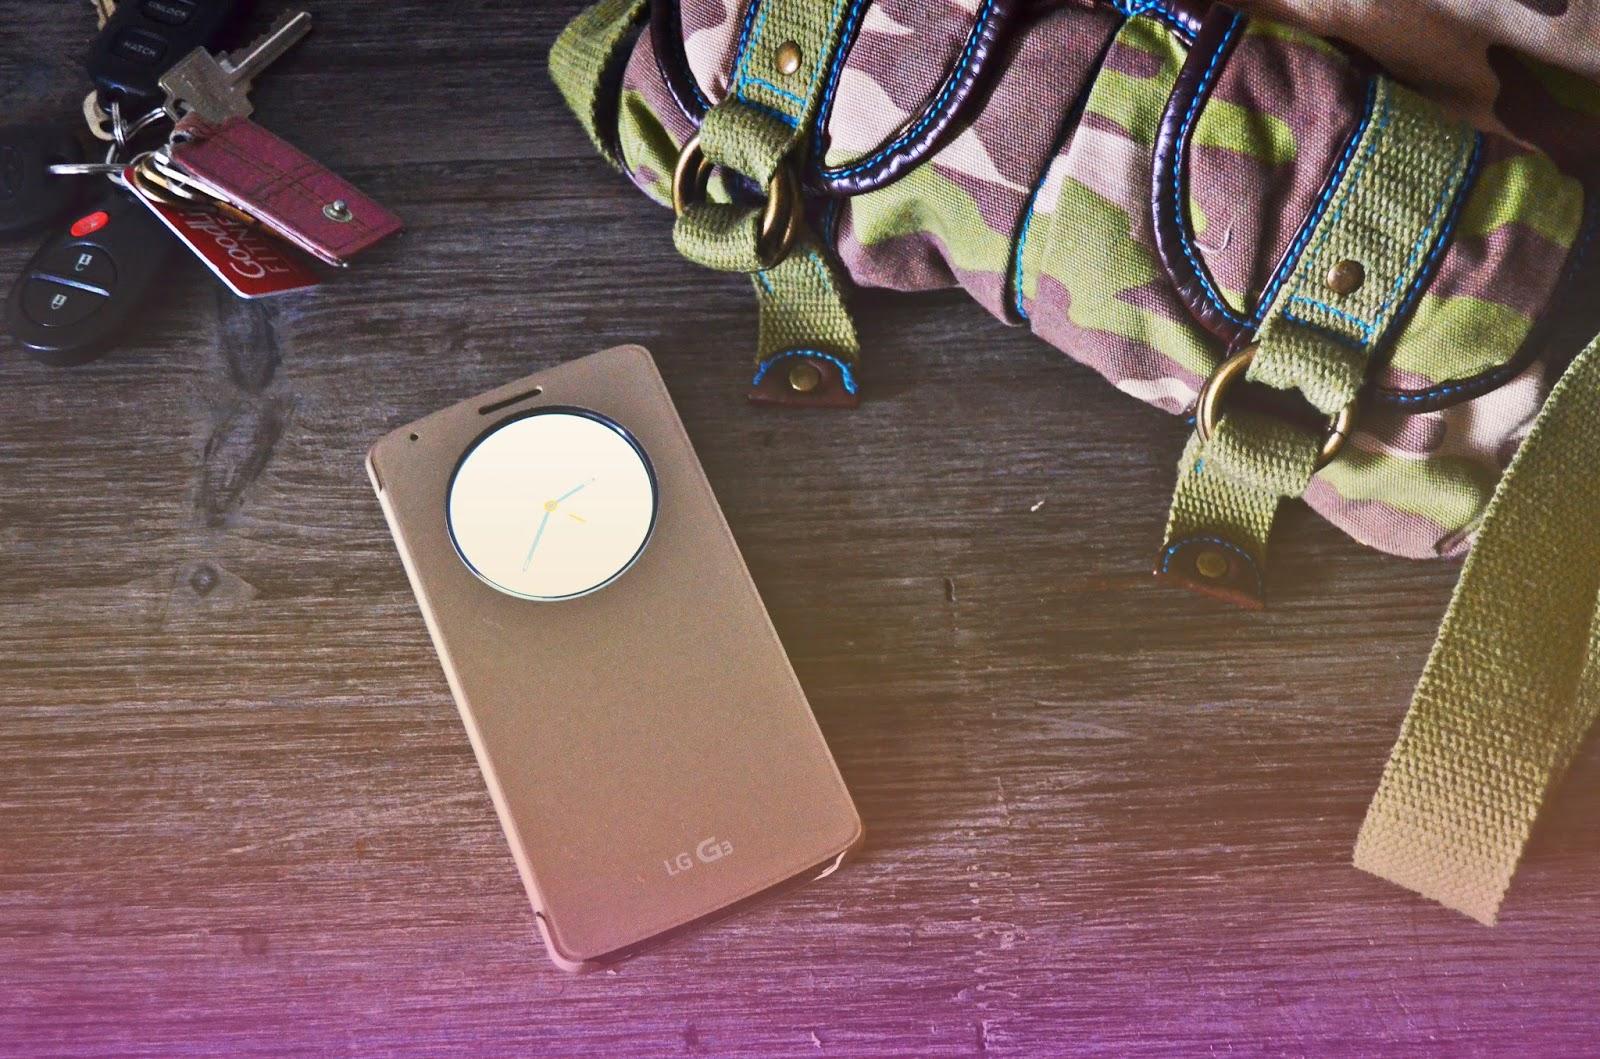 LG G3 cellphone